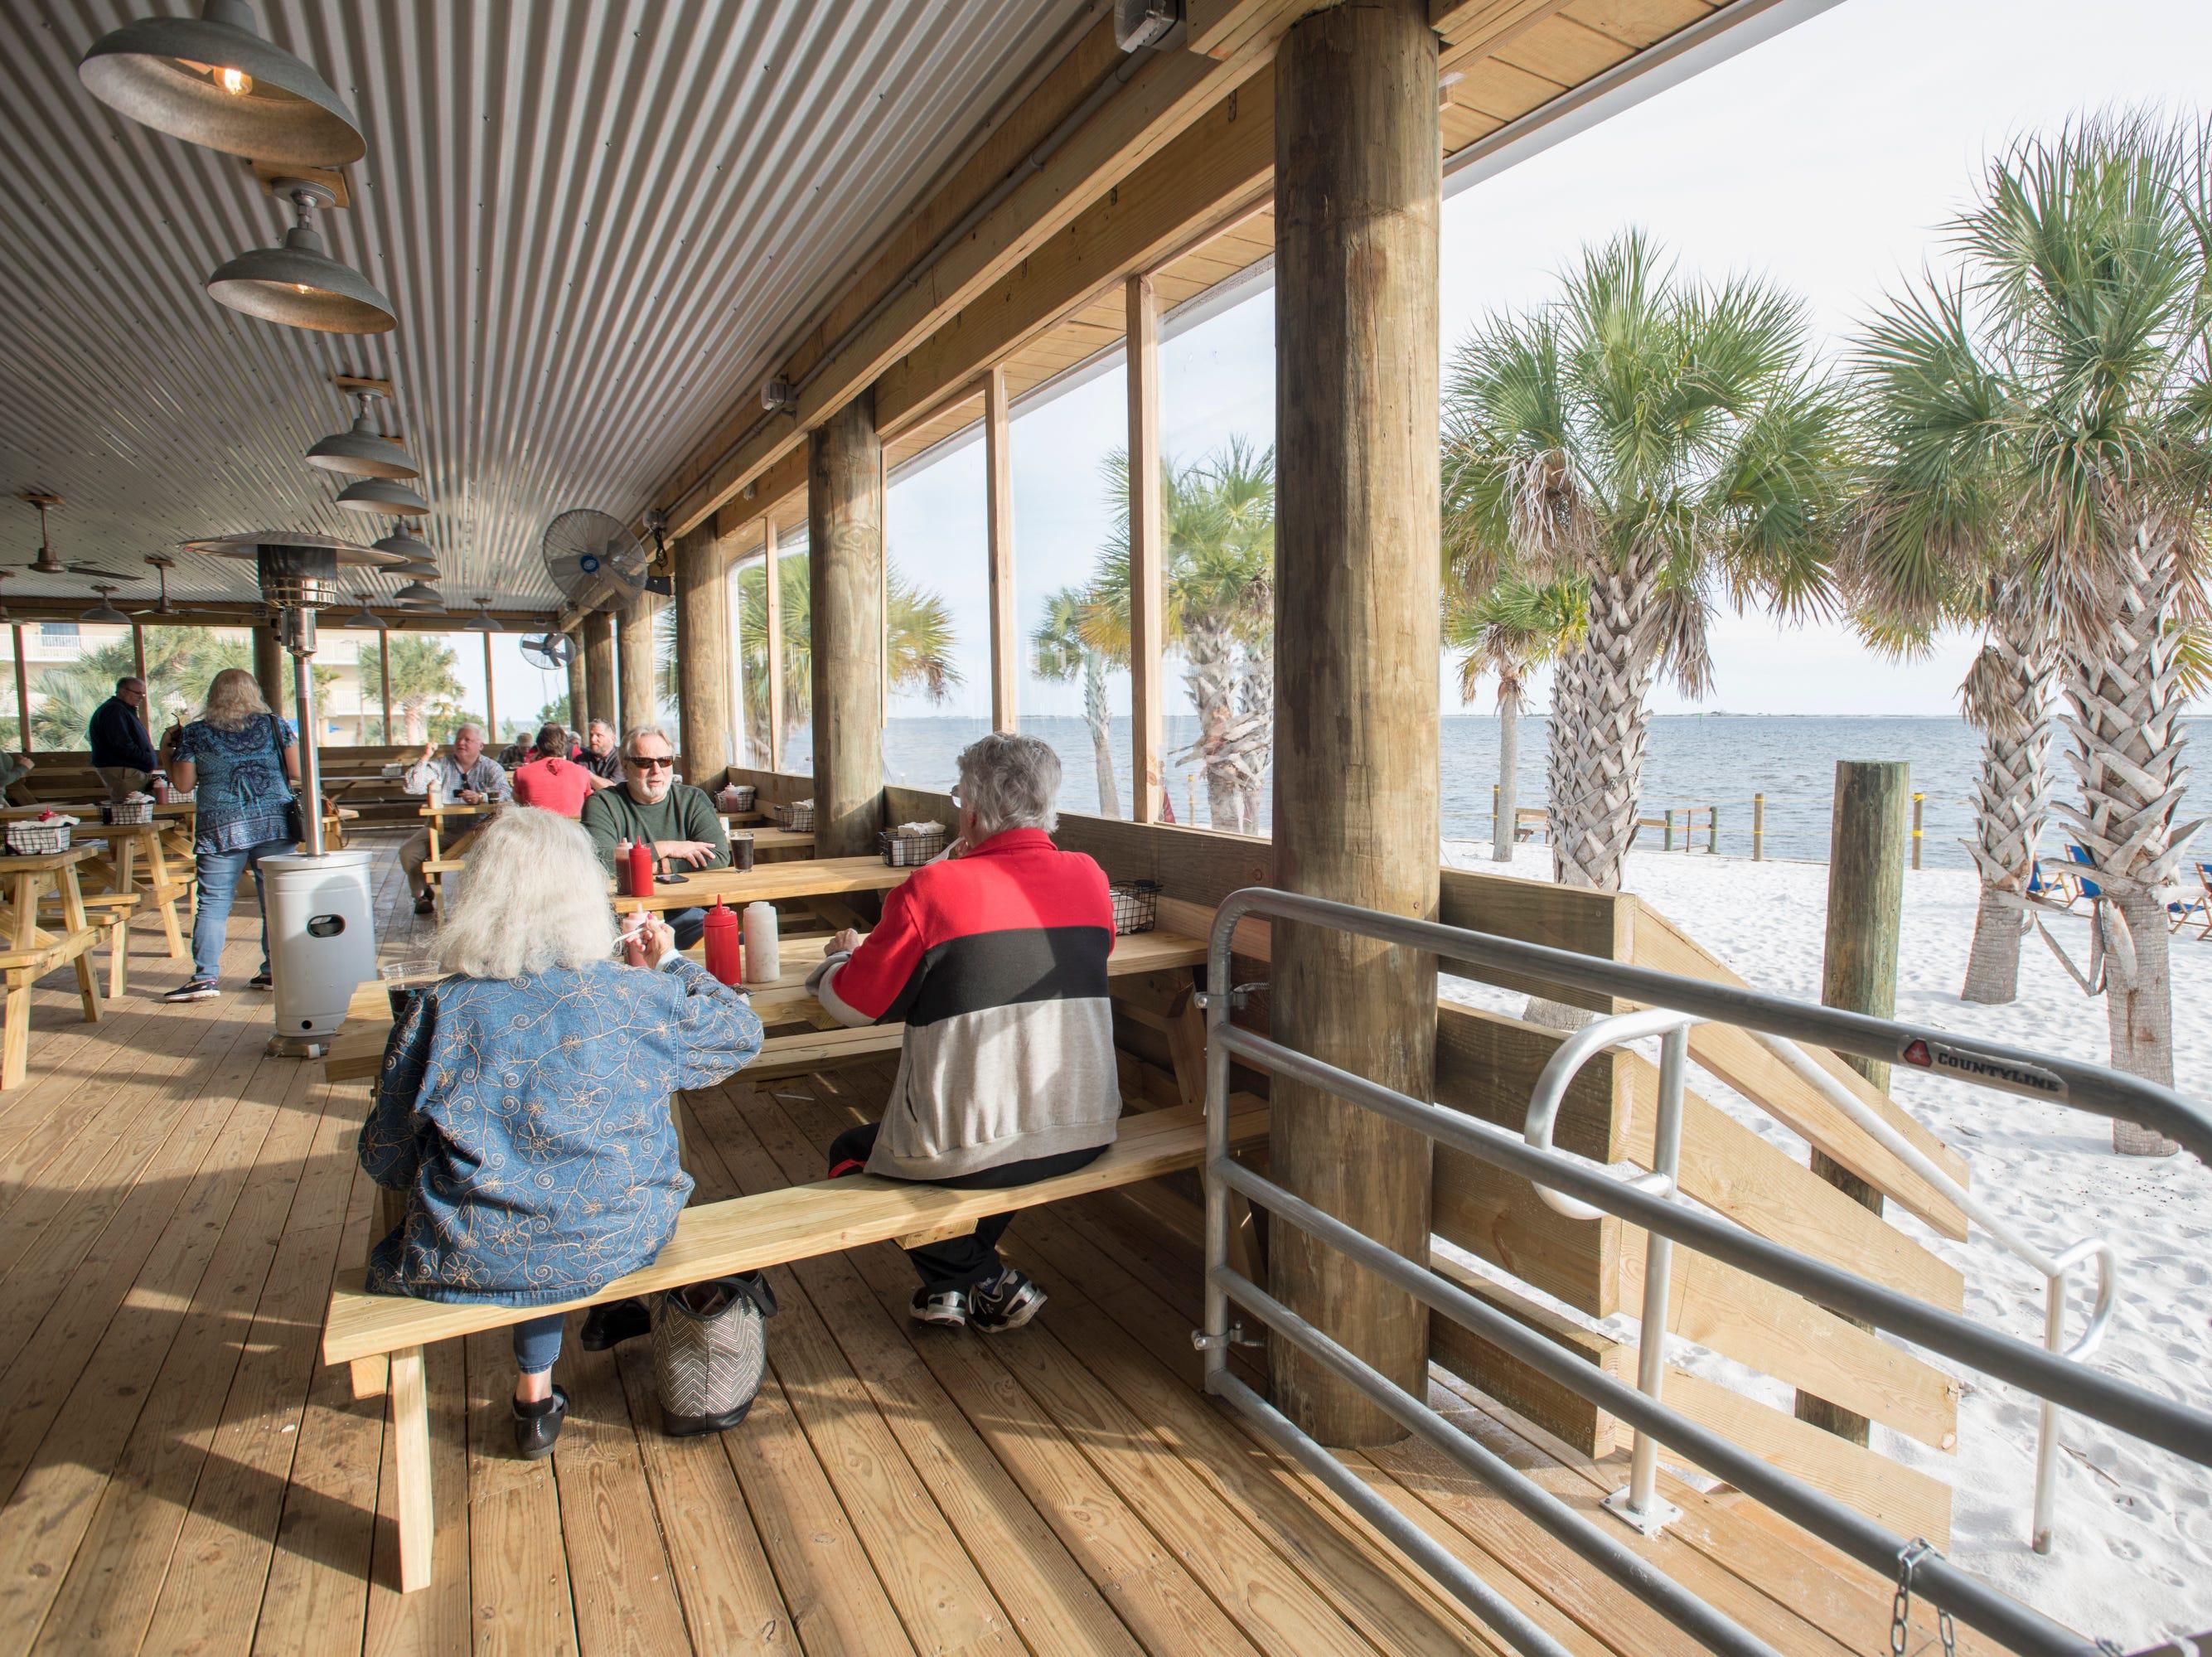 The dining room overlooks Santa Rosa Sound at the new Dewey Destin Seafood Restaurant in Navarre on Thursday, November 29, 2018.